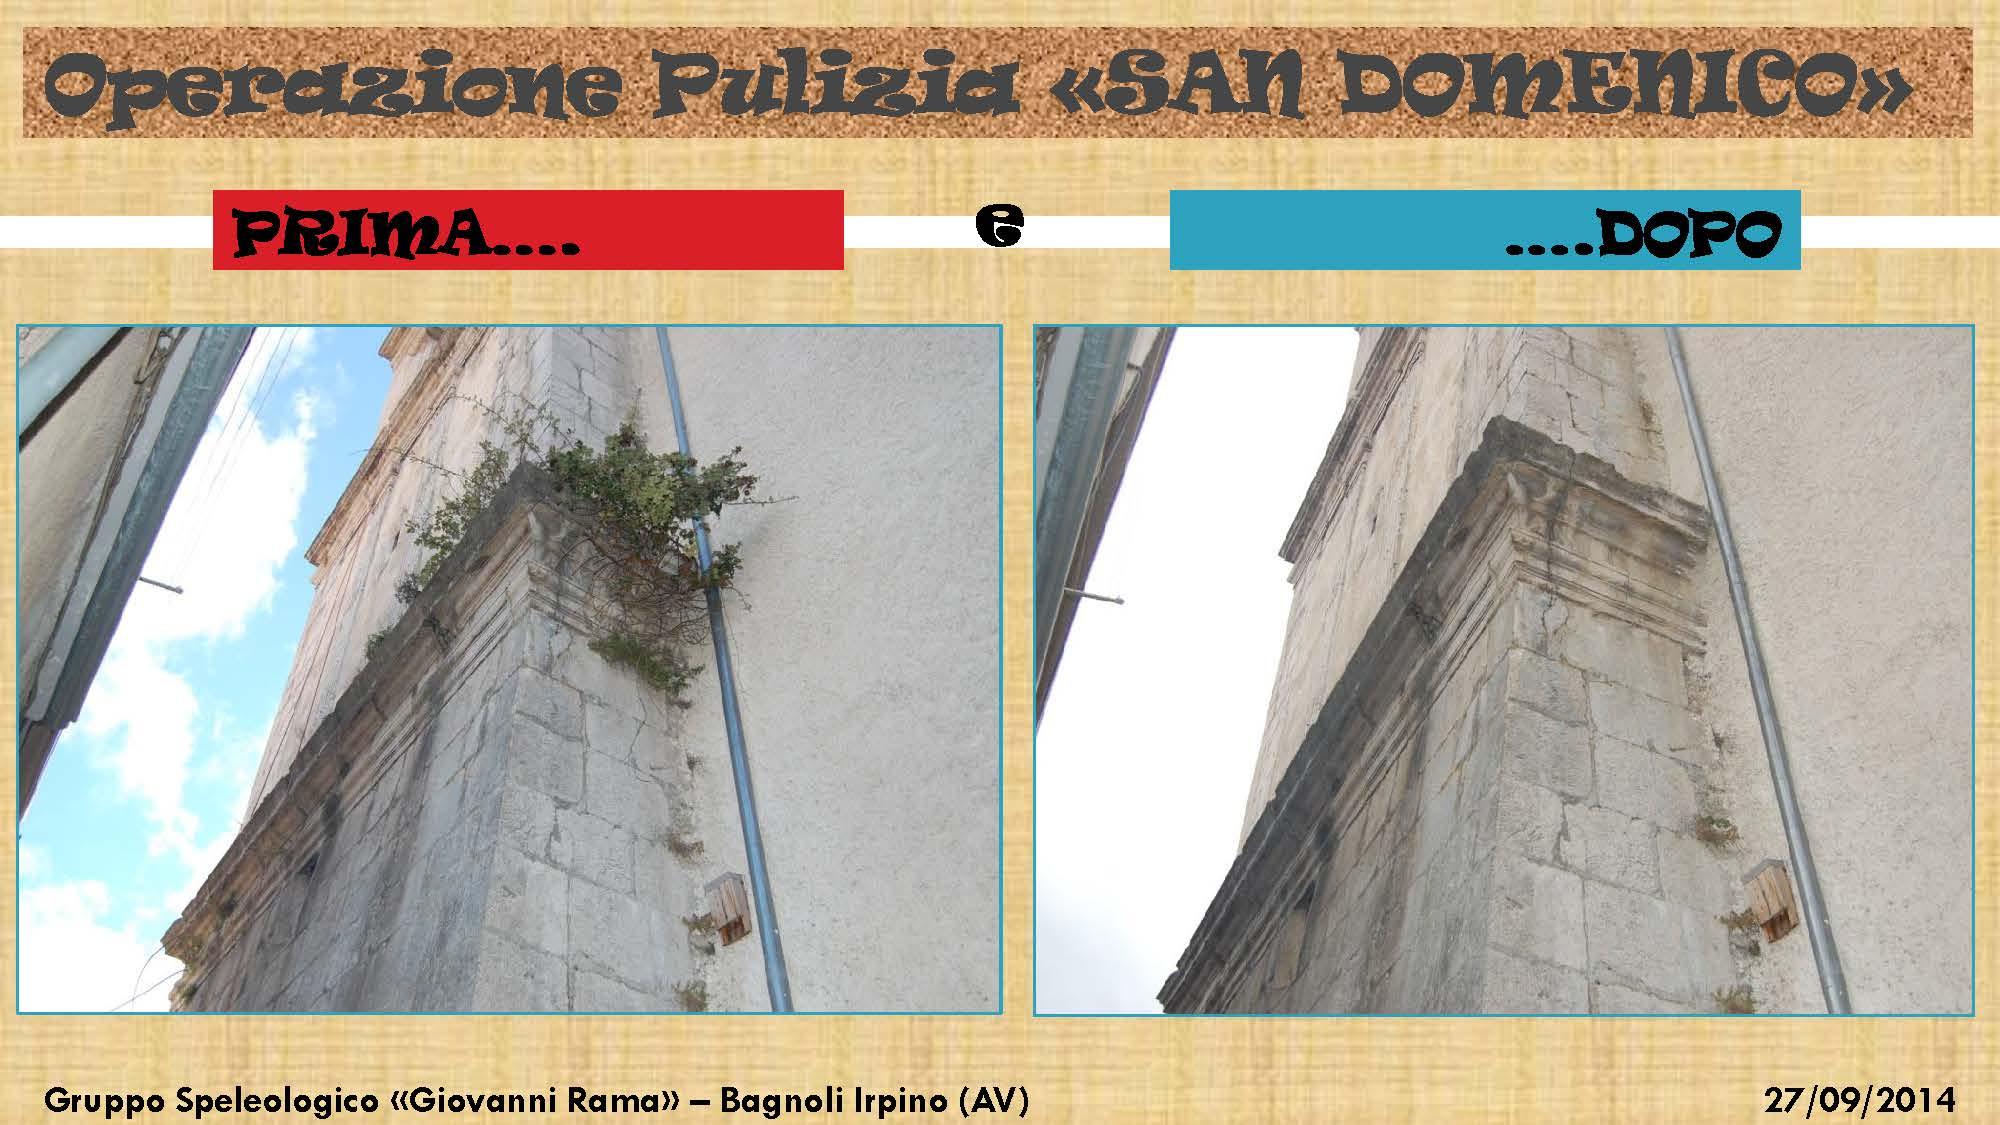 Bagnoli-Pulizia-San-Domenico-2014_Pagina_11